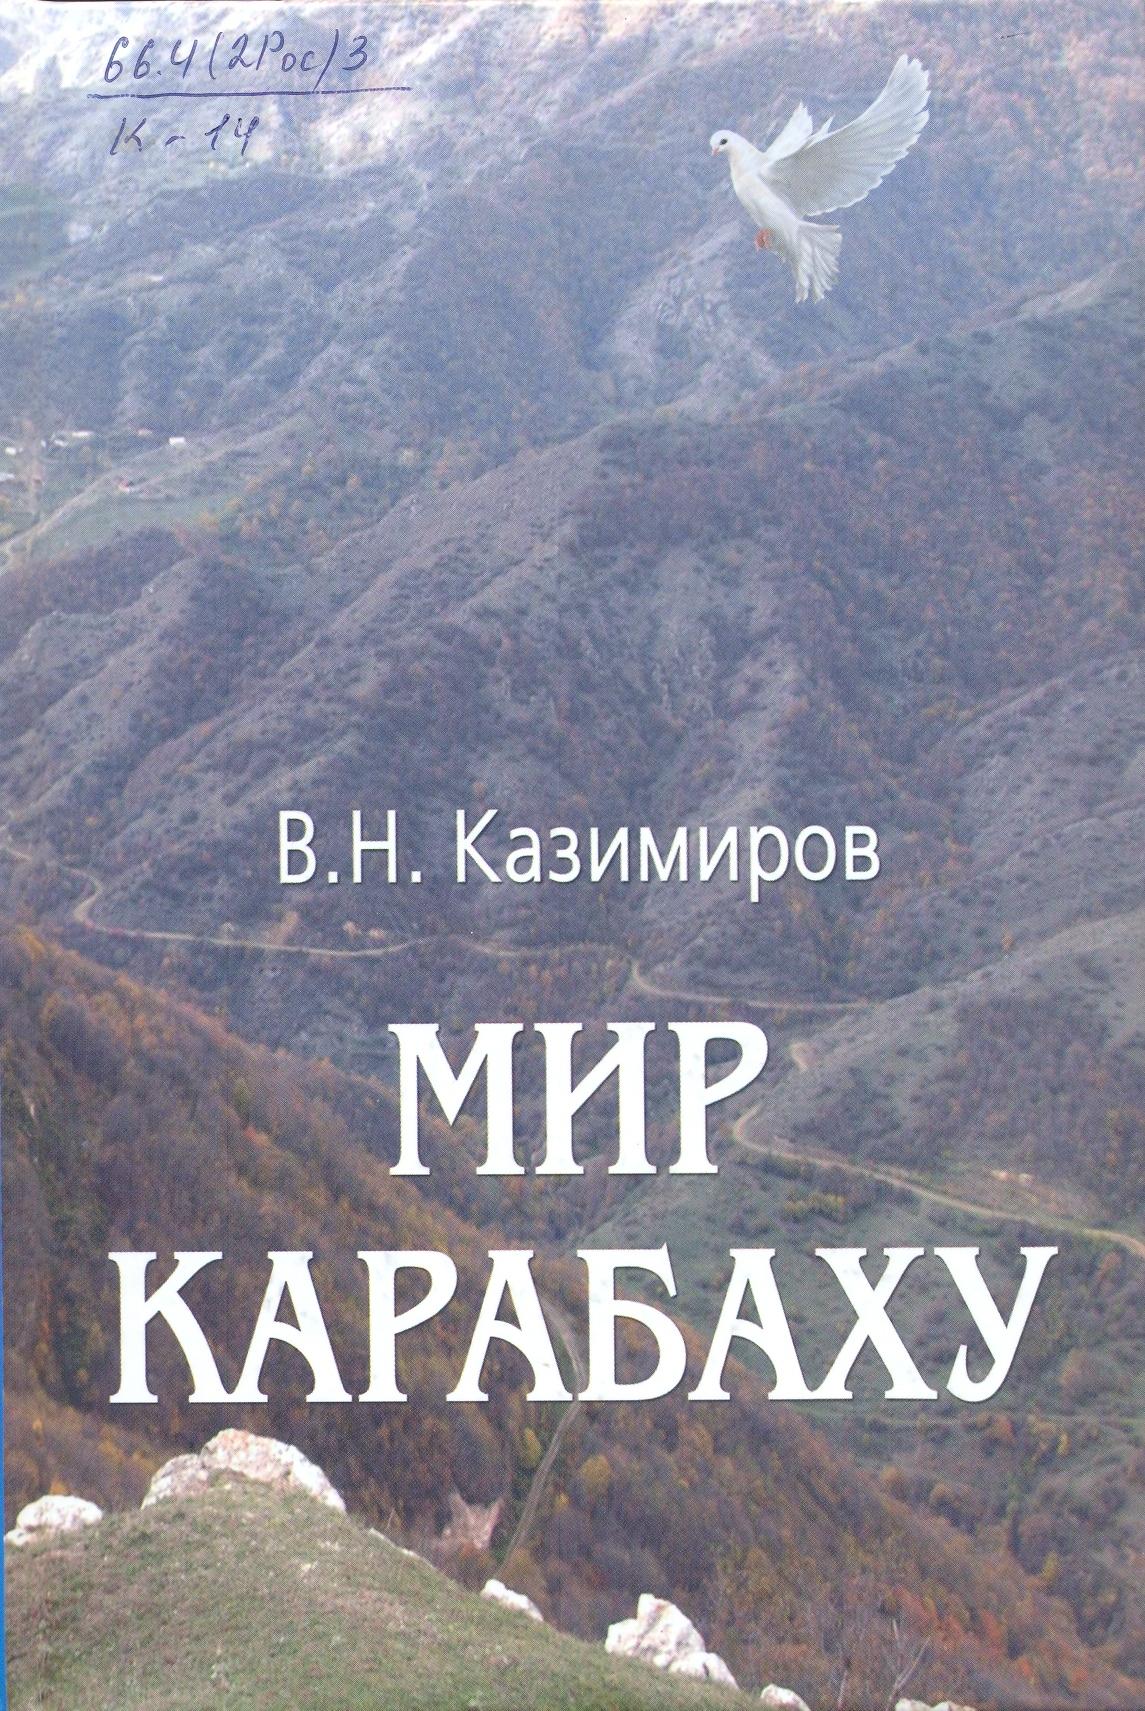 Image result for мир карабаху казимиров